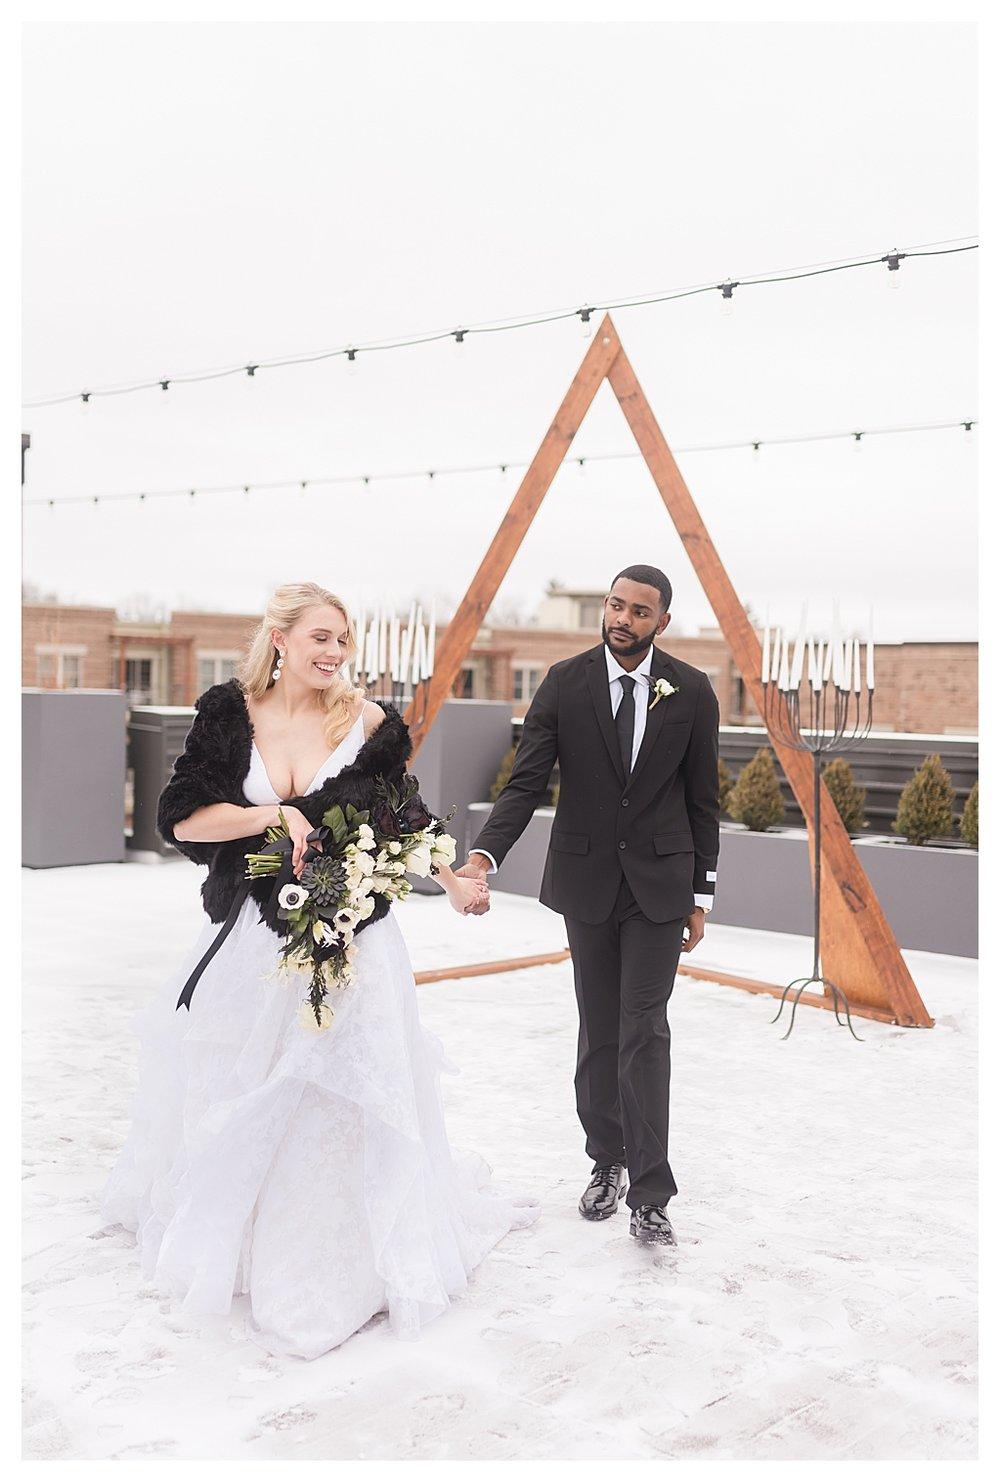 Elegant Black and White Winter Rooftop Wedding_0837.jpg